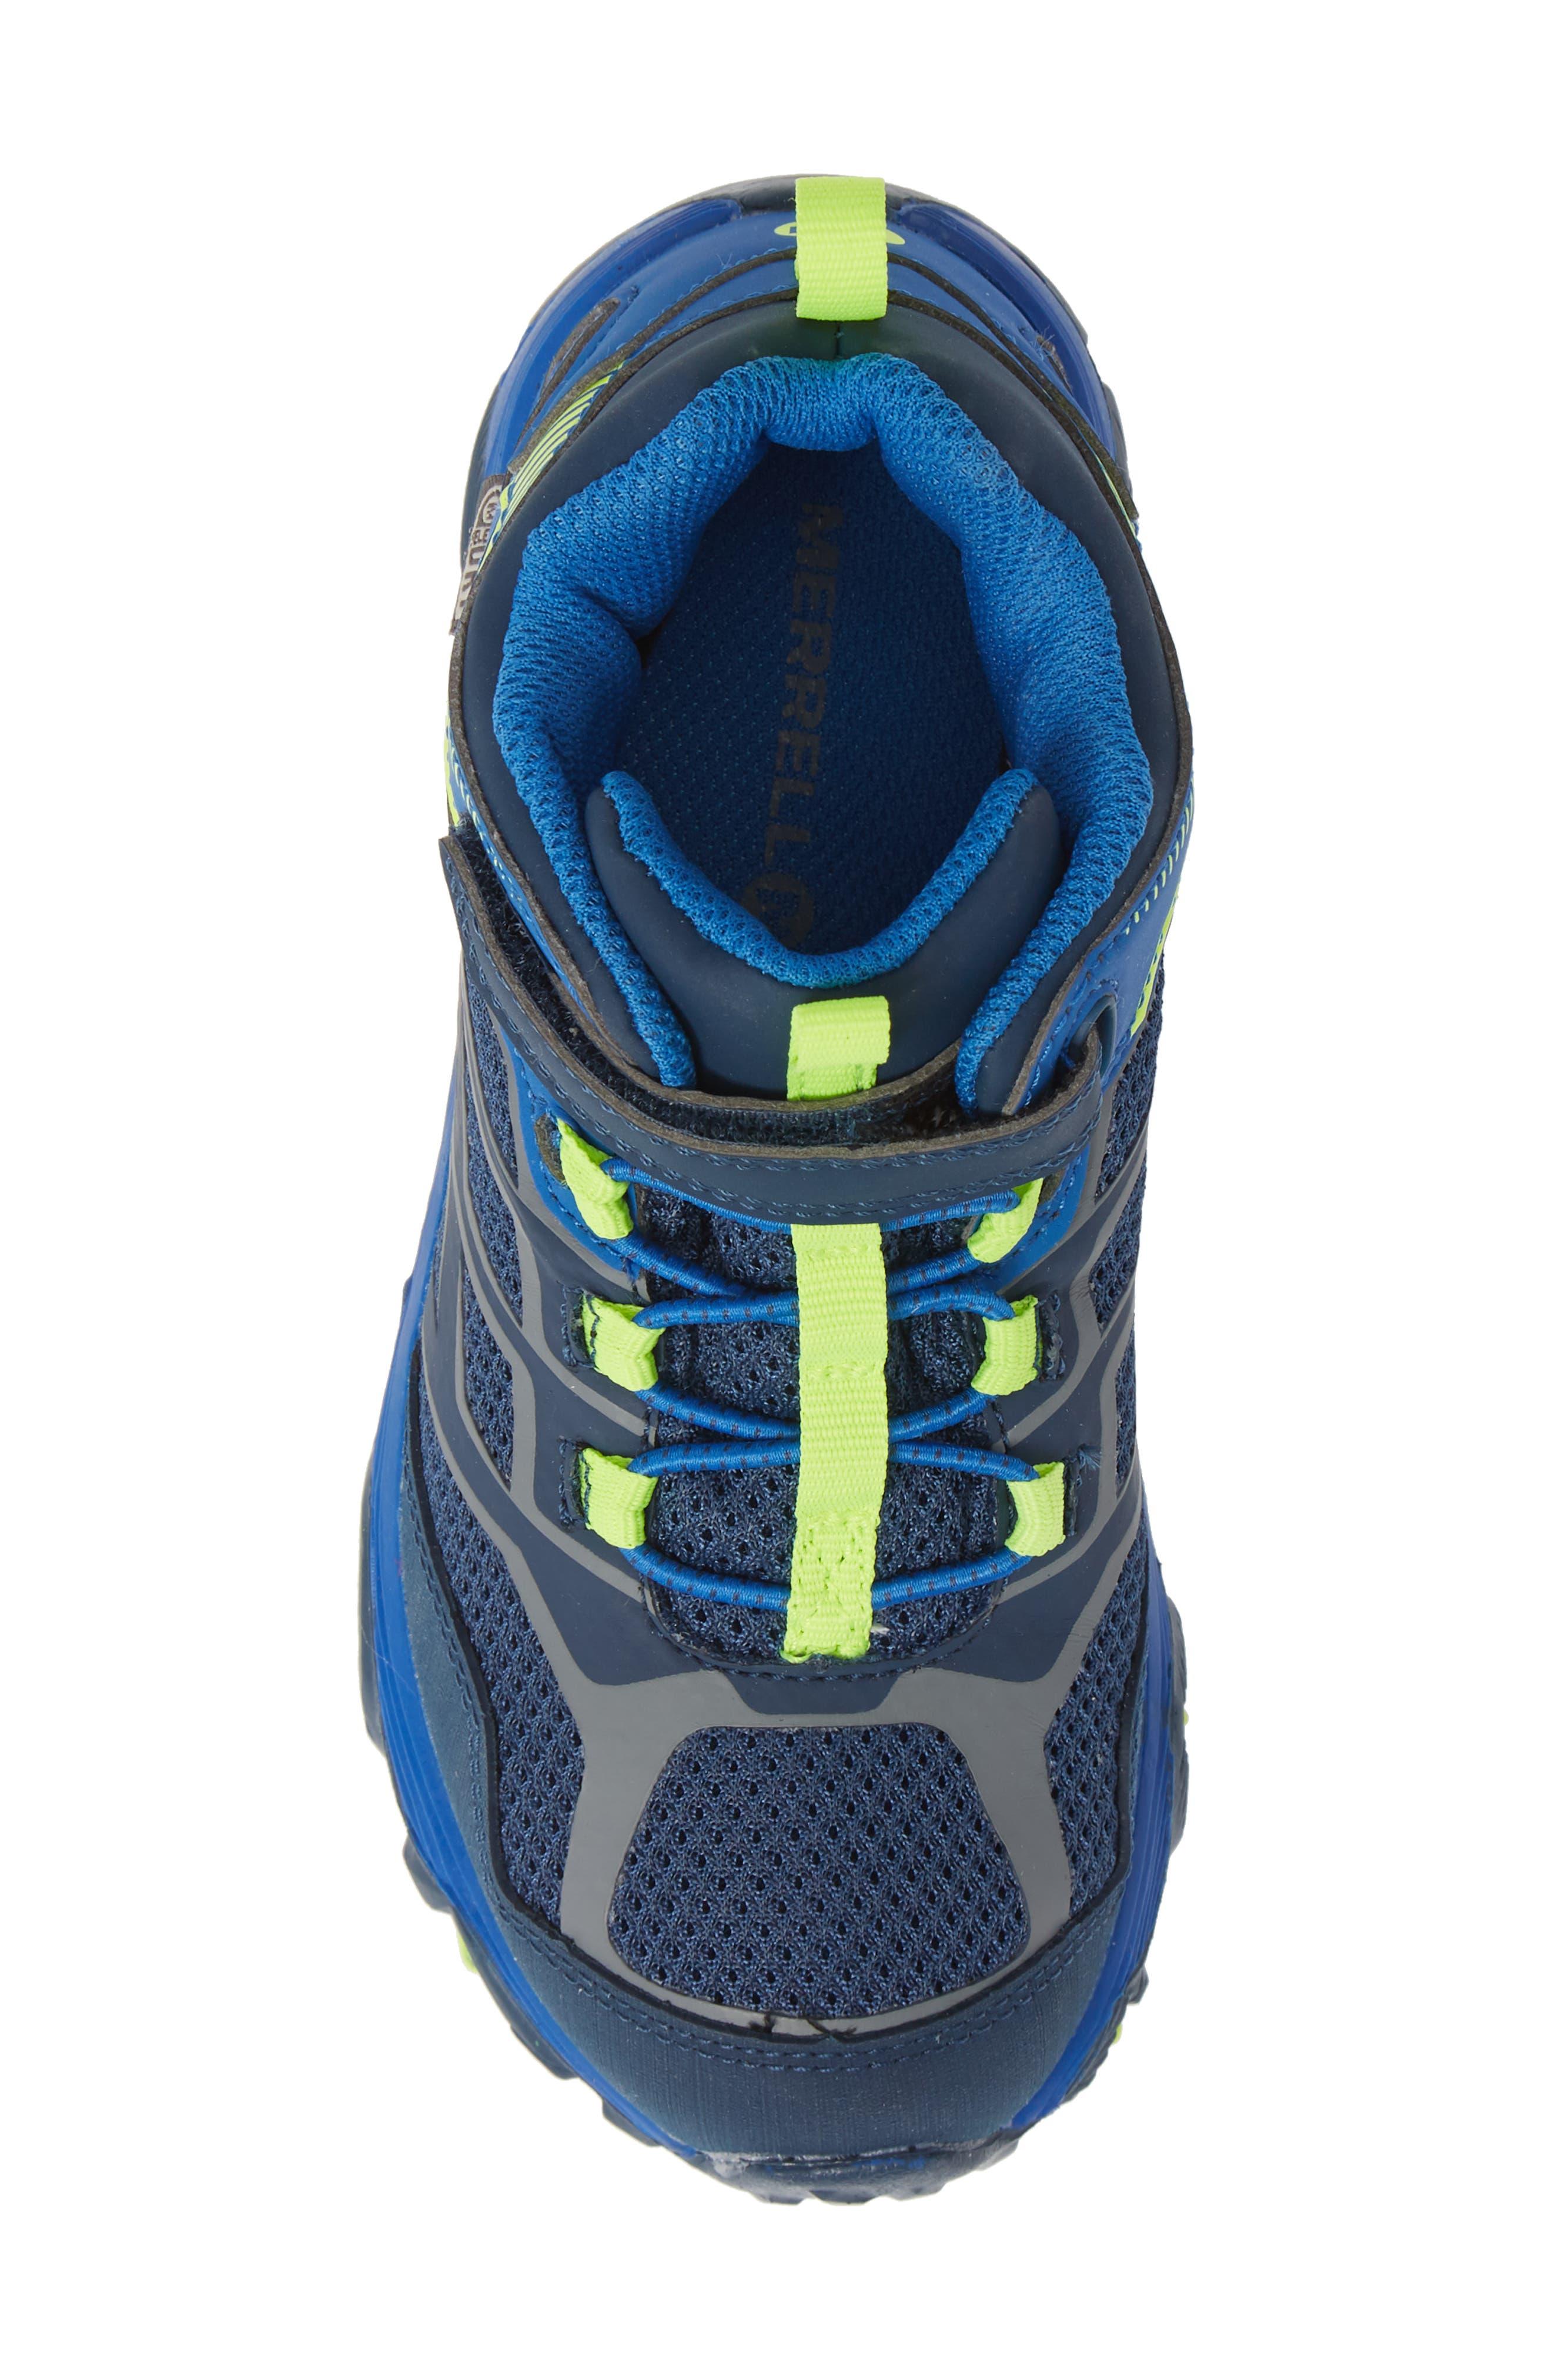 MERRELL, Moab FST Mid Top Waterproof Sneaker Boot, Alternate thumbnail 5, color, NAVY/ COBALT